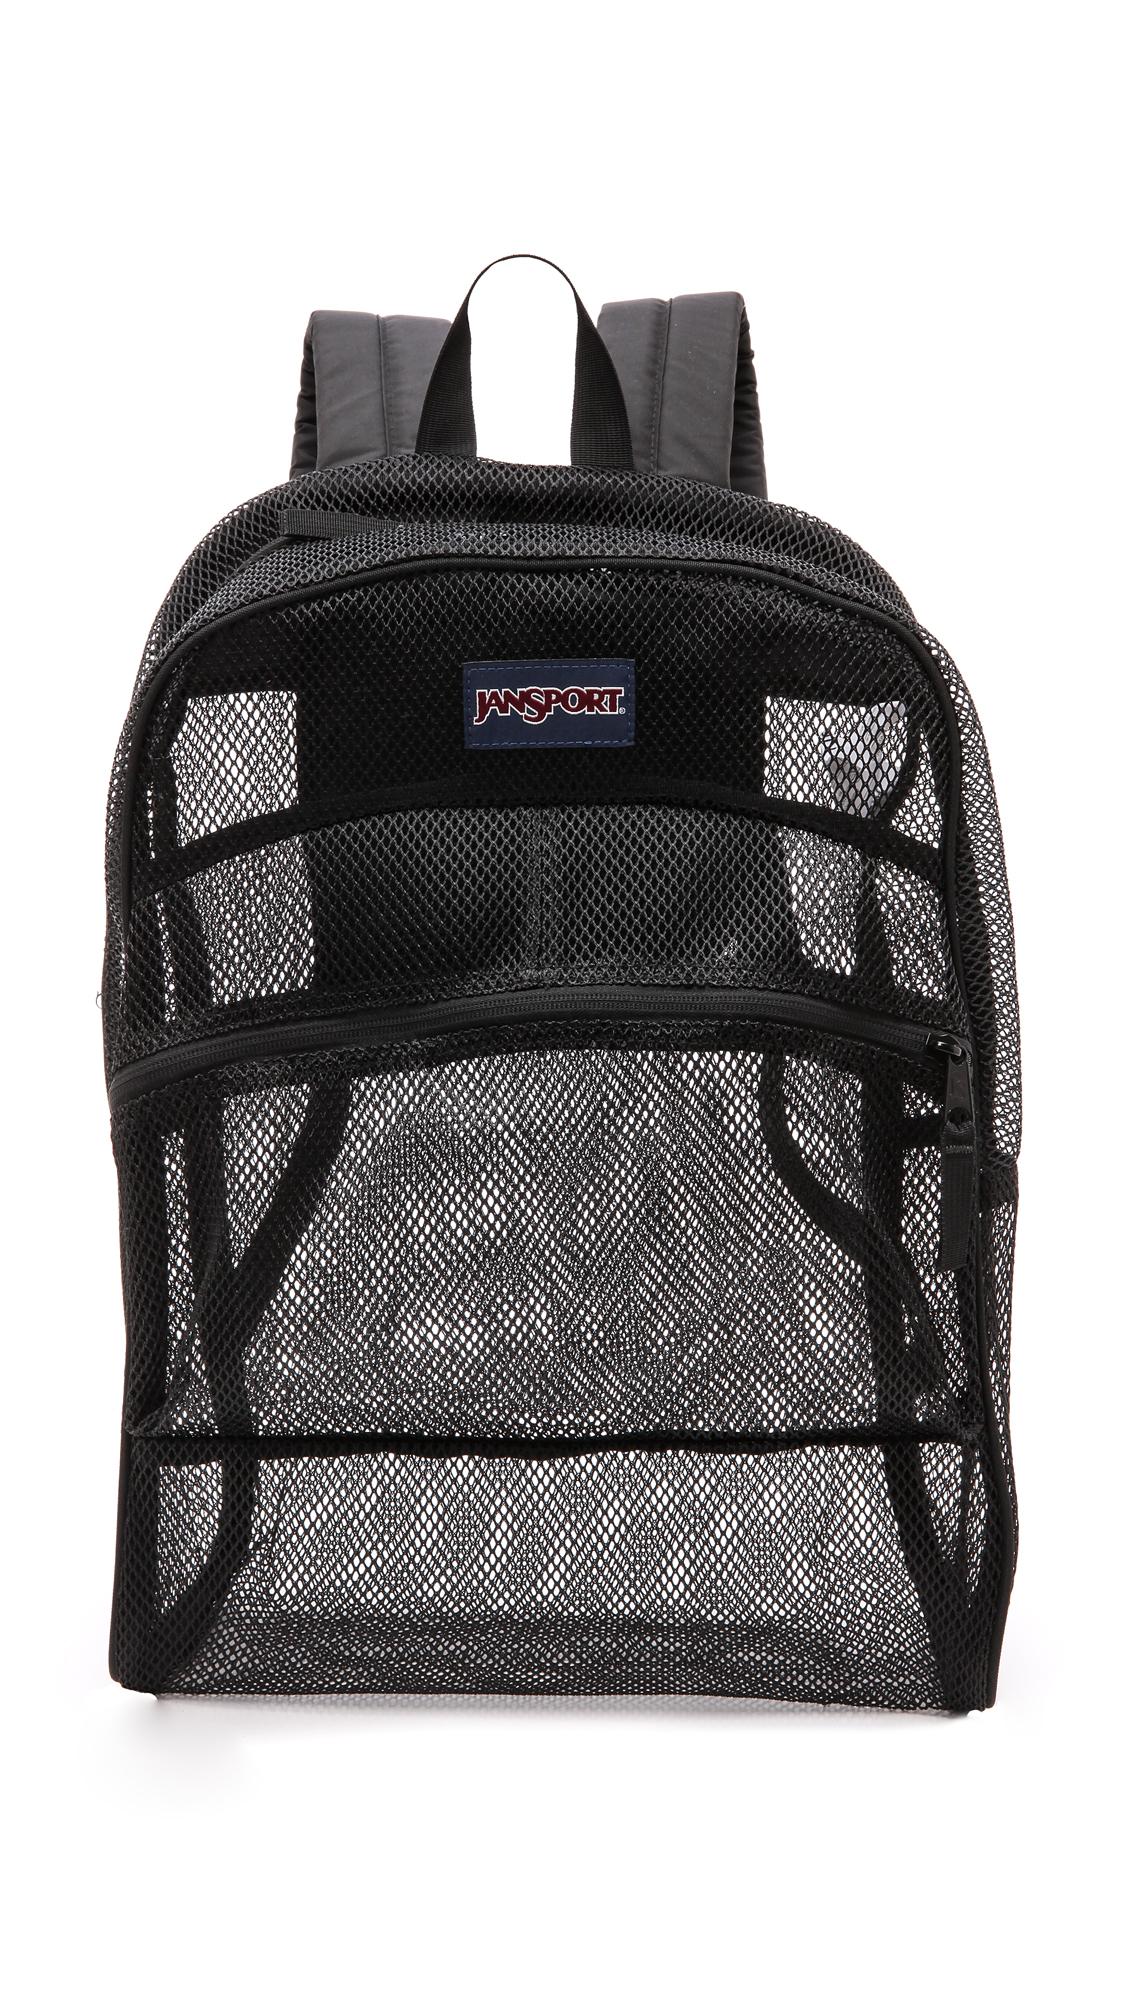 Jansport Mesh Backpack Black In Black Lyst